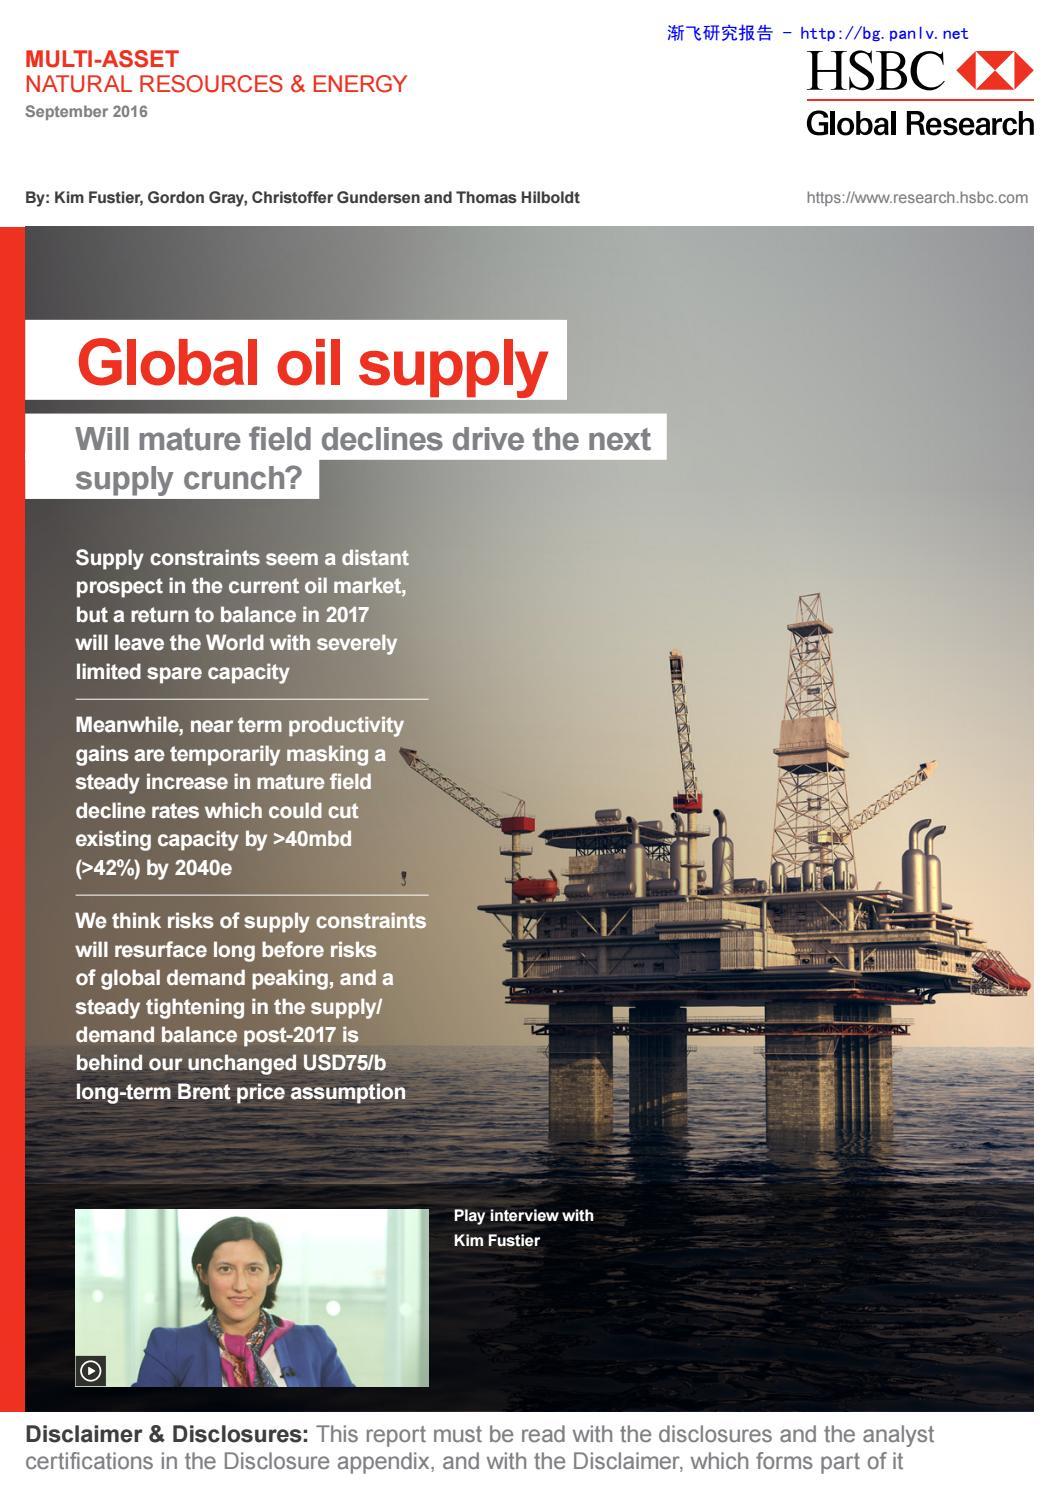 Global oil supply peak oil report hsbc global research